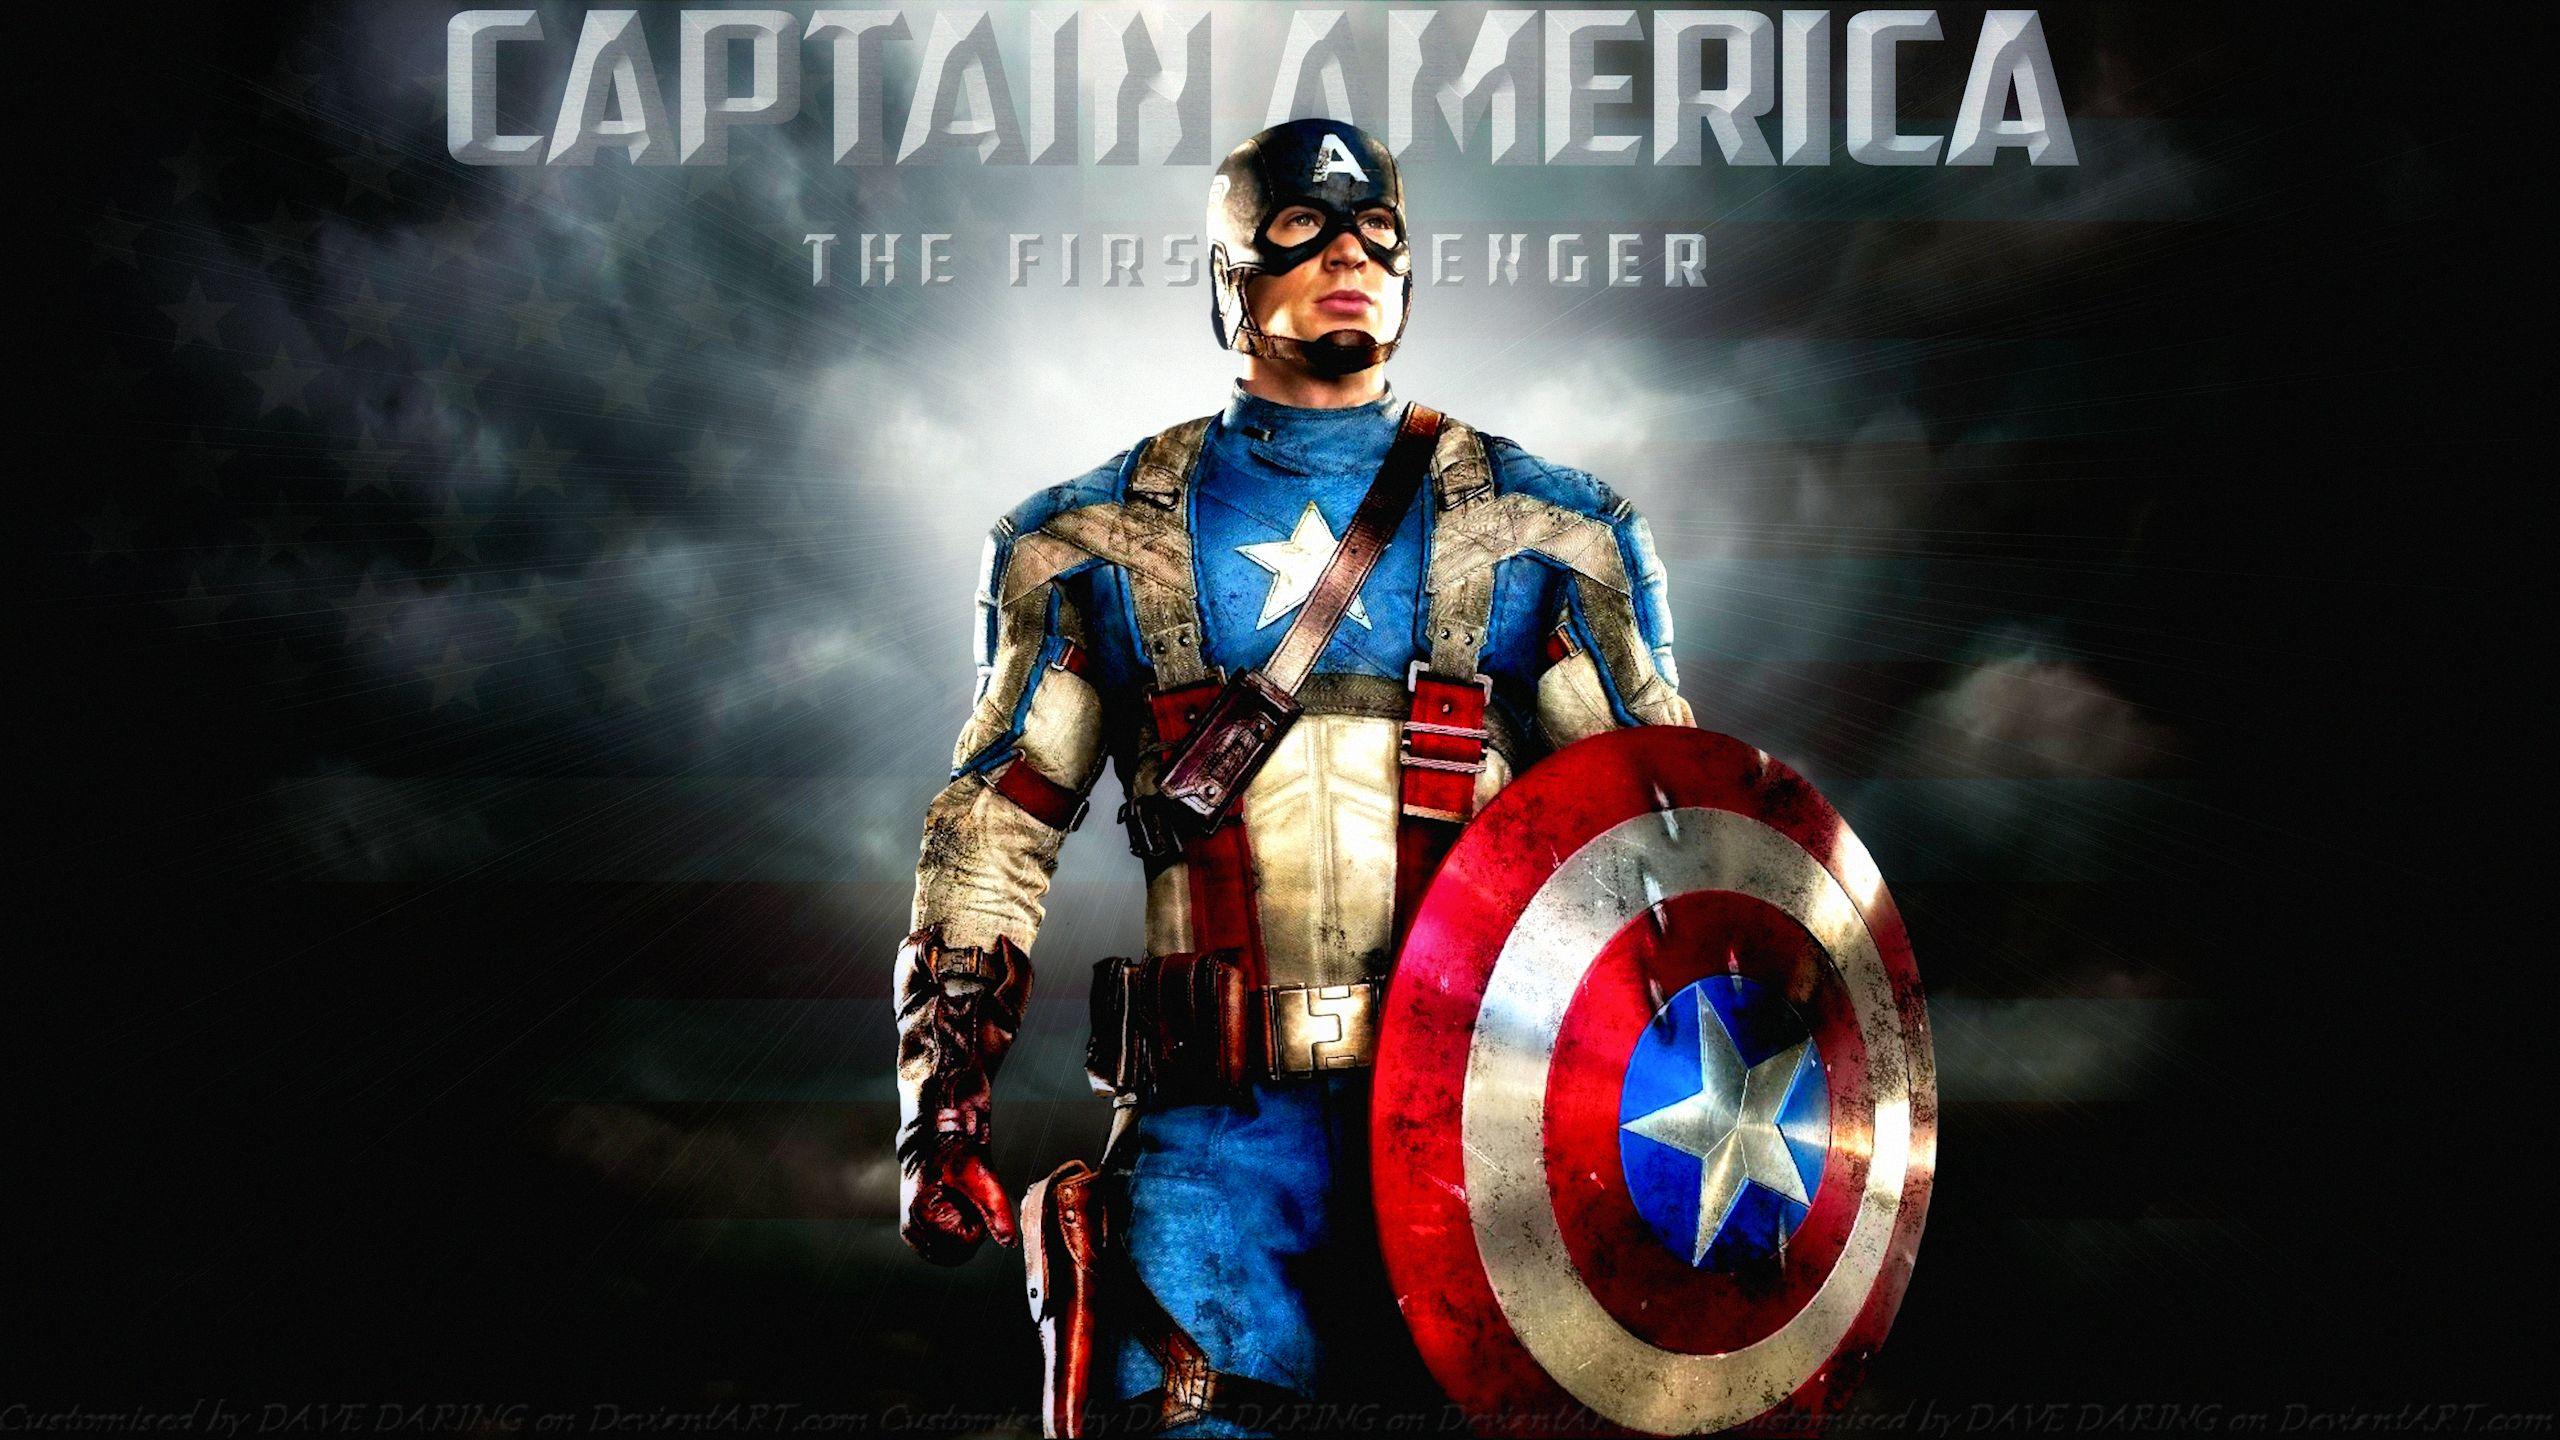 Free Download Captain America Wallpaper Chris Evans Wallpaper 1231507 2560x1440 For Your Desktop Mobile Tablet Explore 86 Captain America Wallpapers Captain America Wallpaper Captain America Wallpapers Captain America Comic Wallpaper